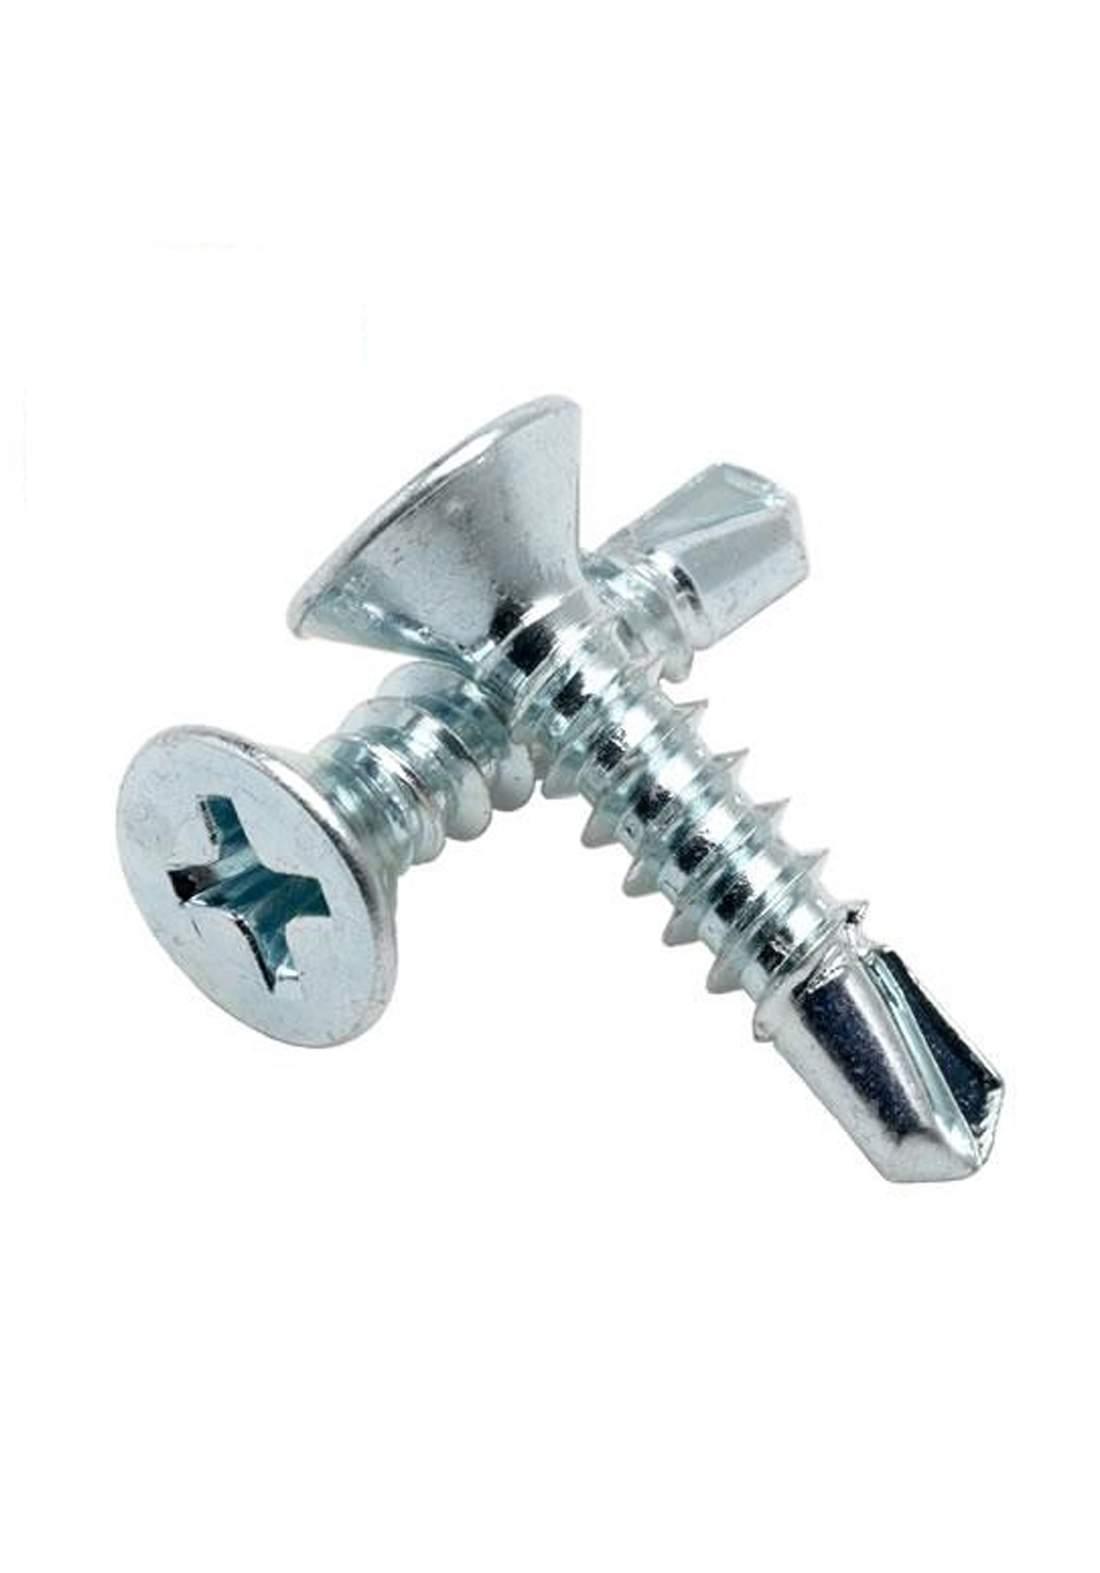 Patta Self Drilling Screw Flat Phillips 4.2*16 mm برغي فيليبس